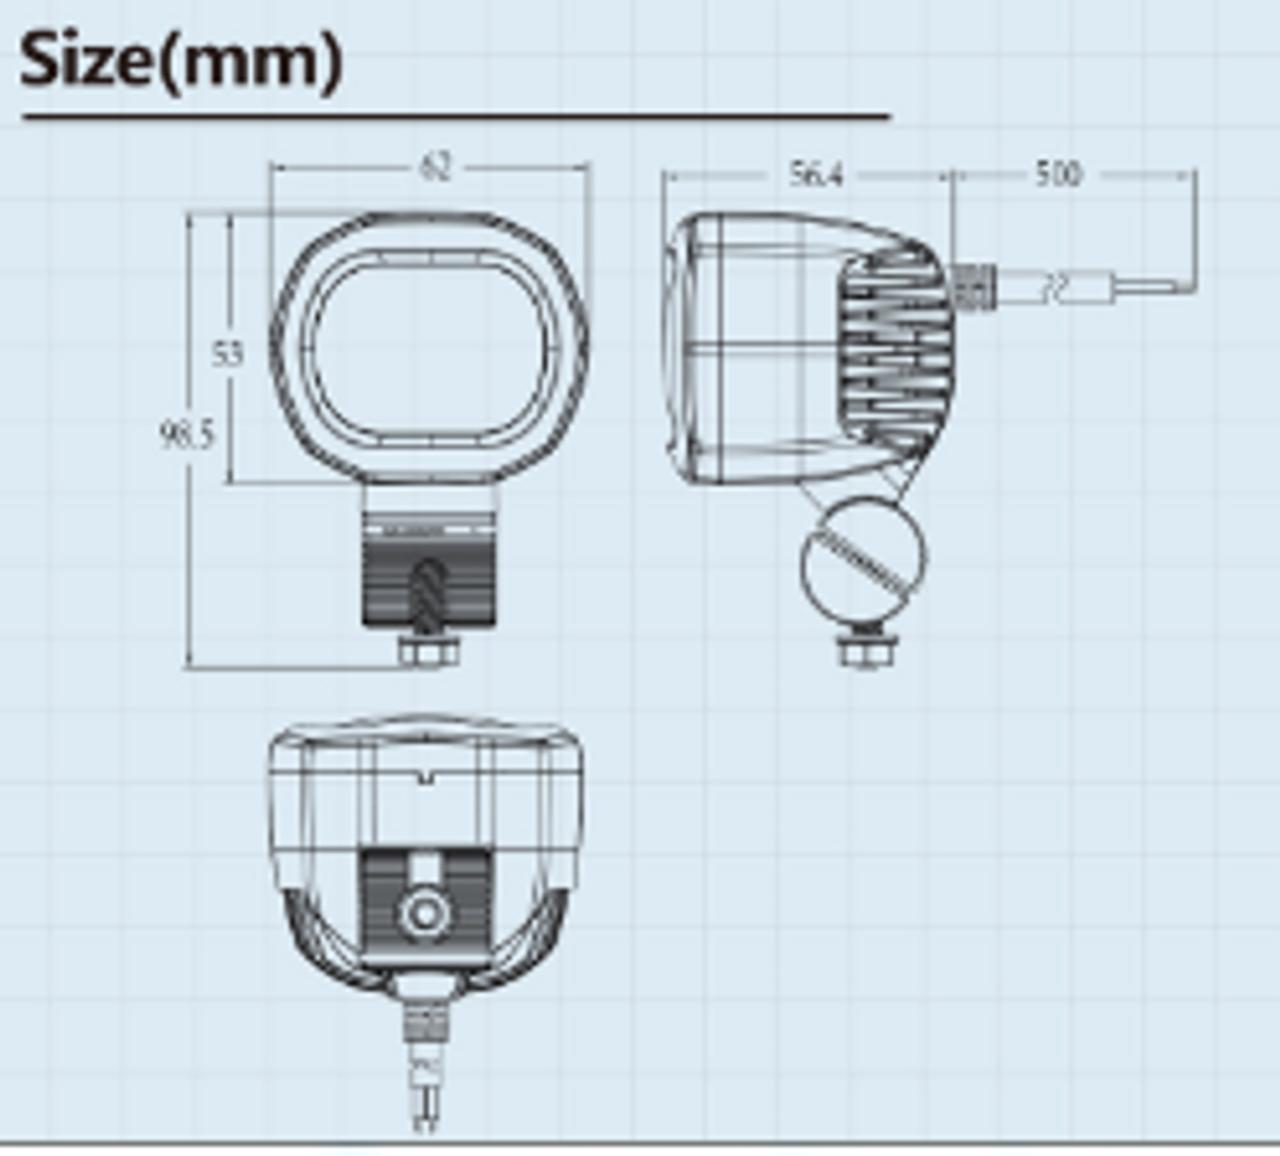 Dimension - 62 x 53 x 57mm. Weight 0.20kg